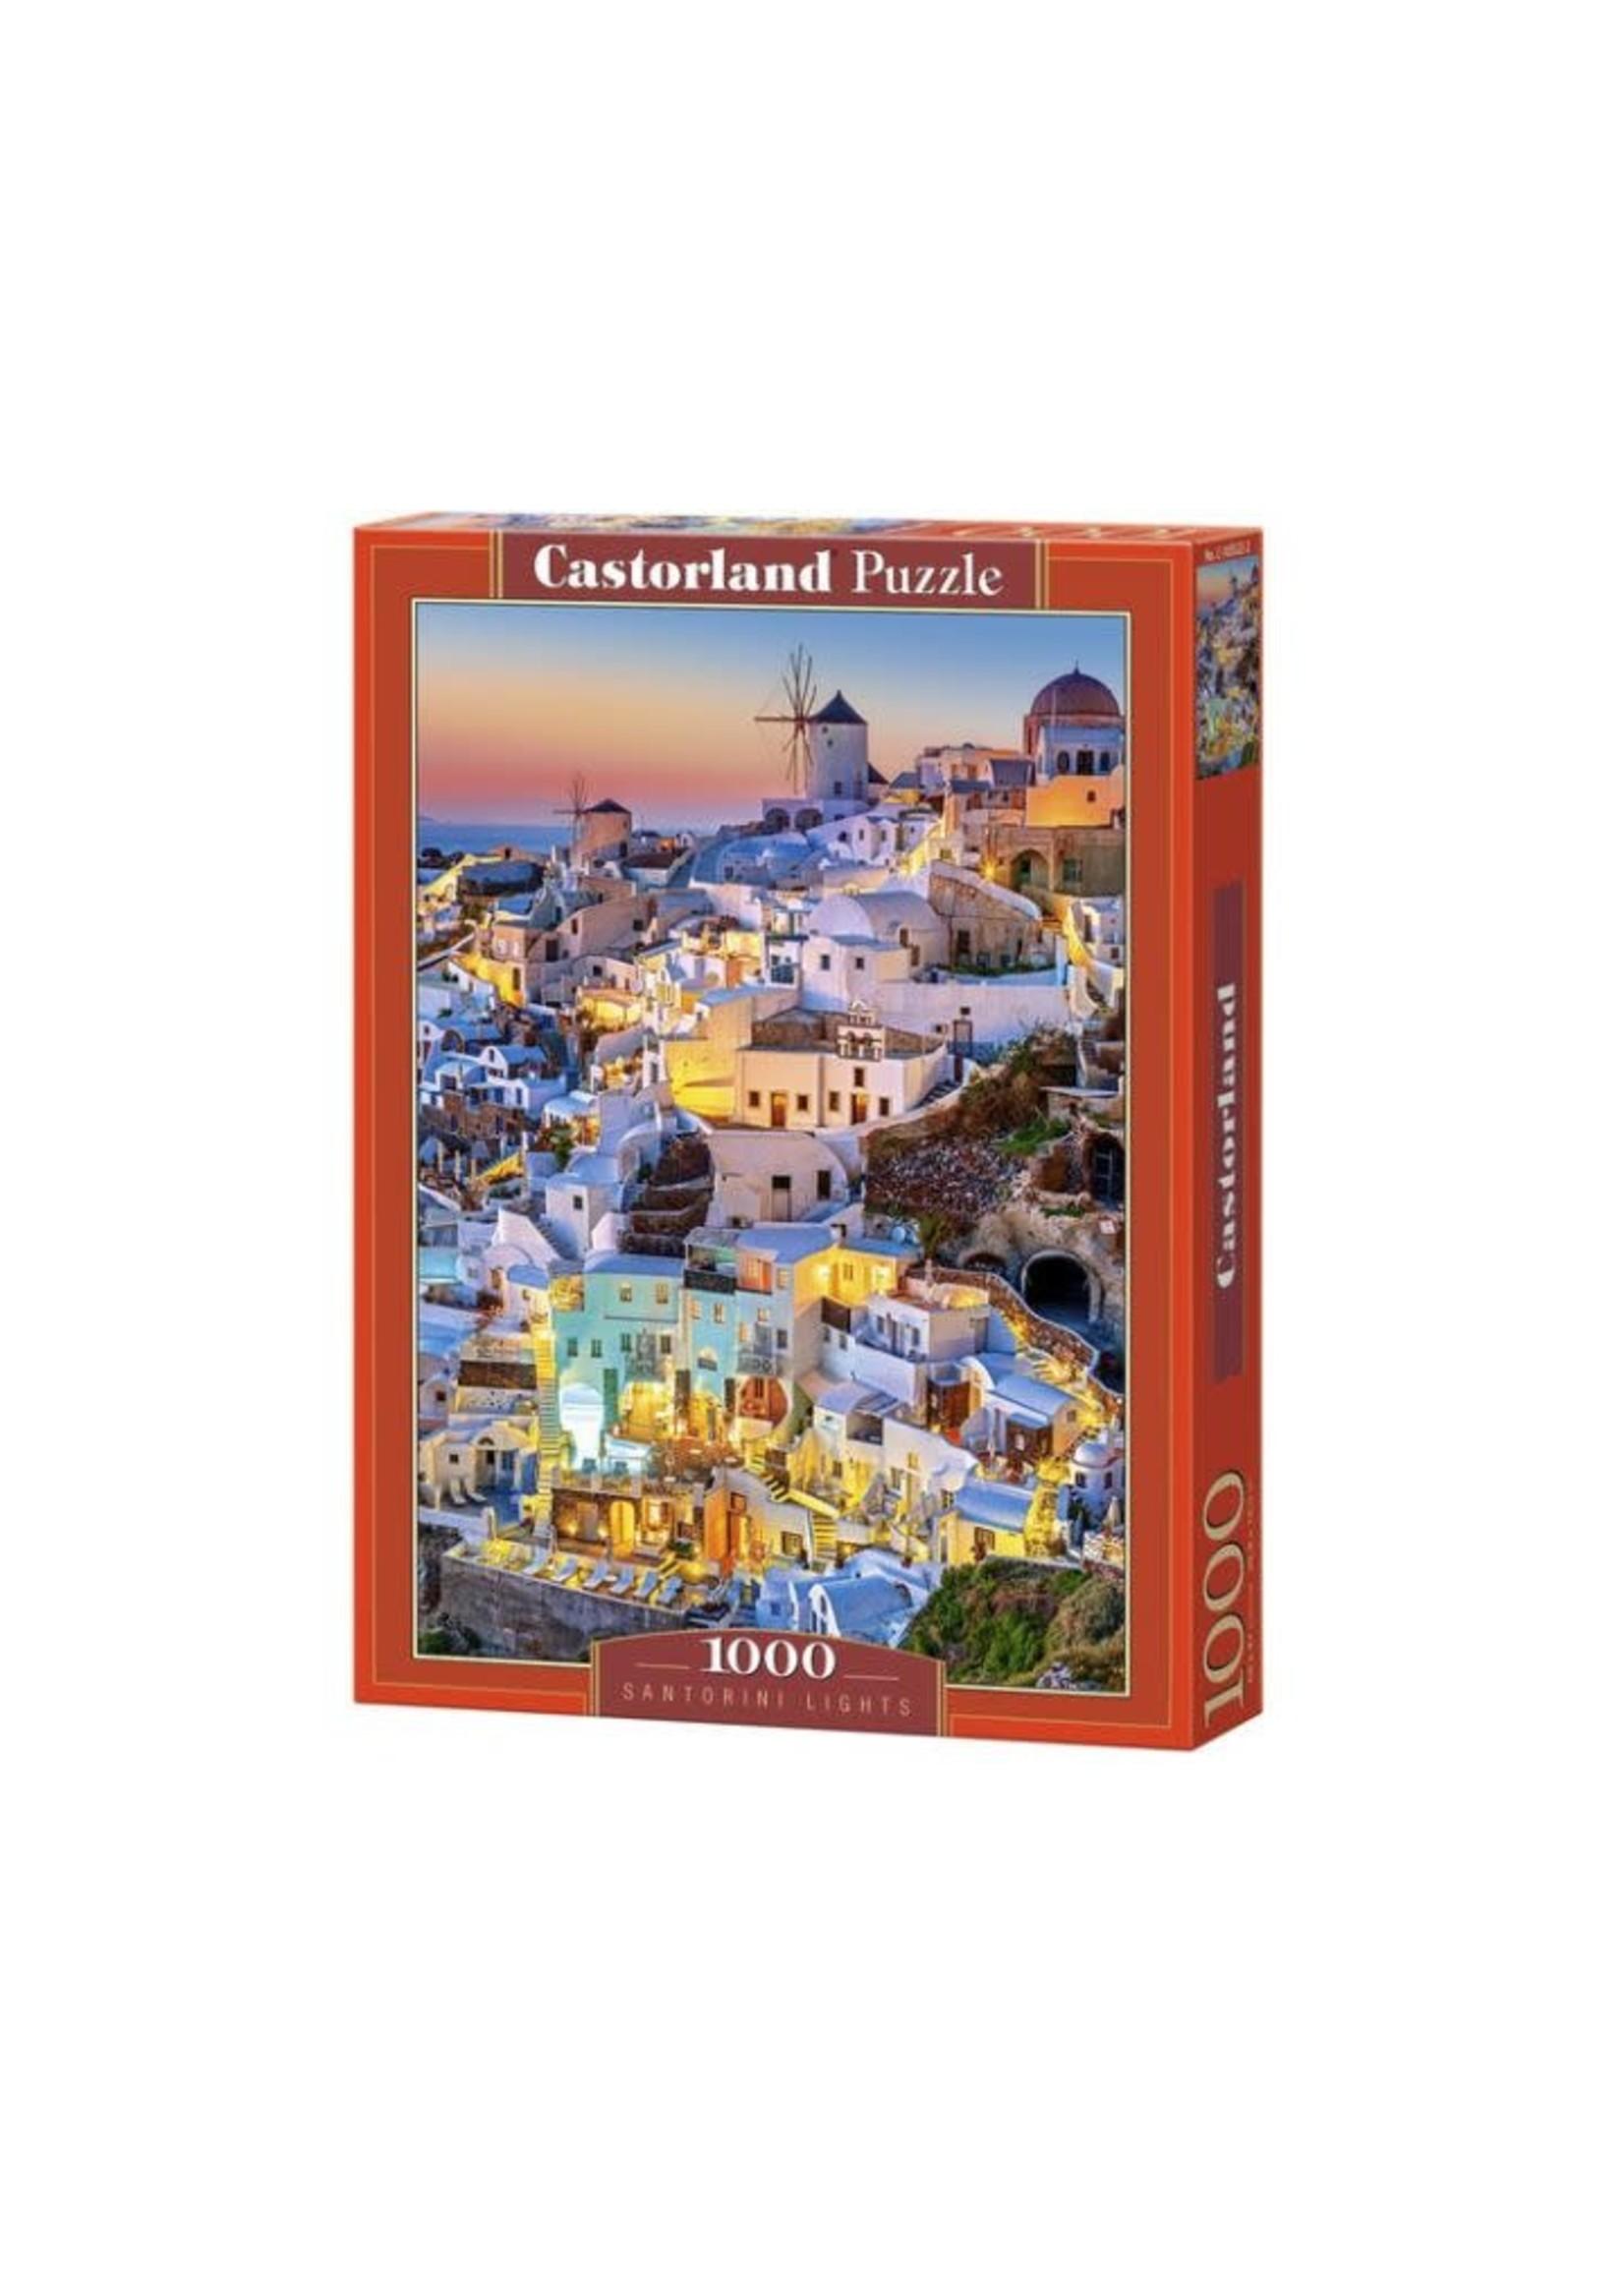 Castorland Santorini Lights (1000 Pcs.)